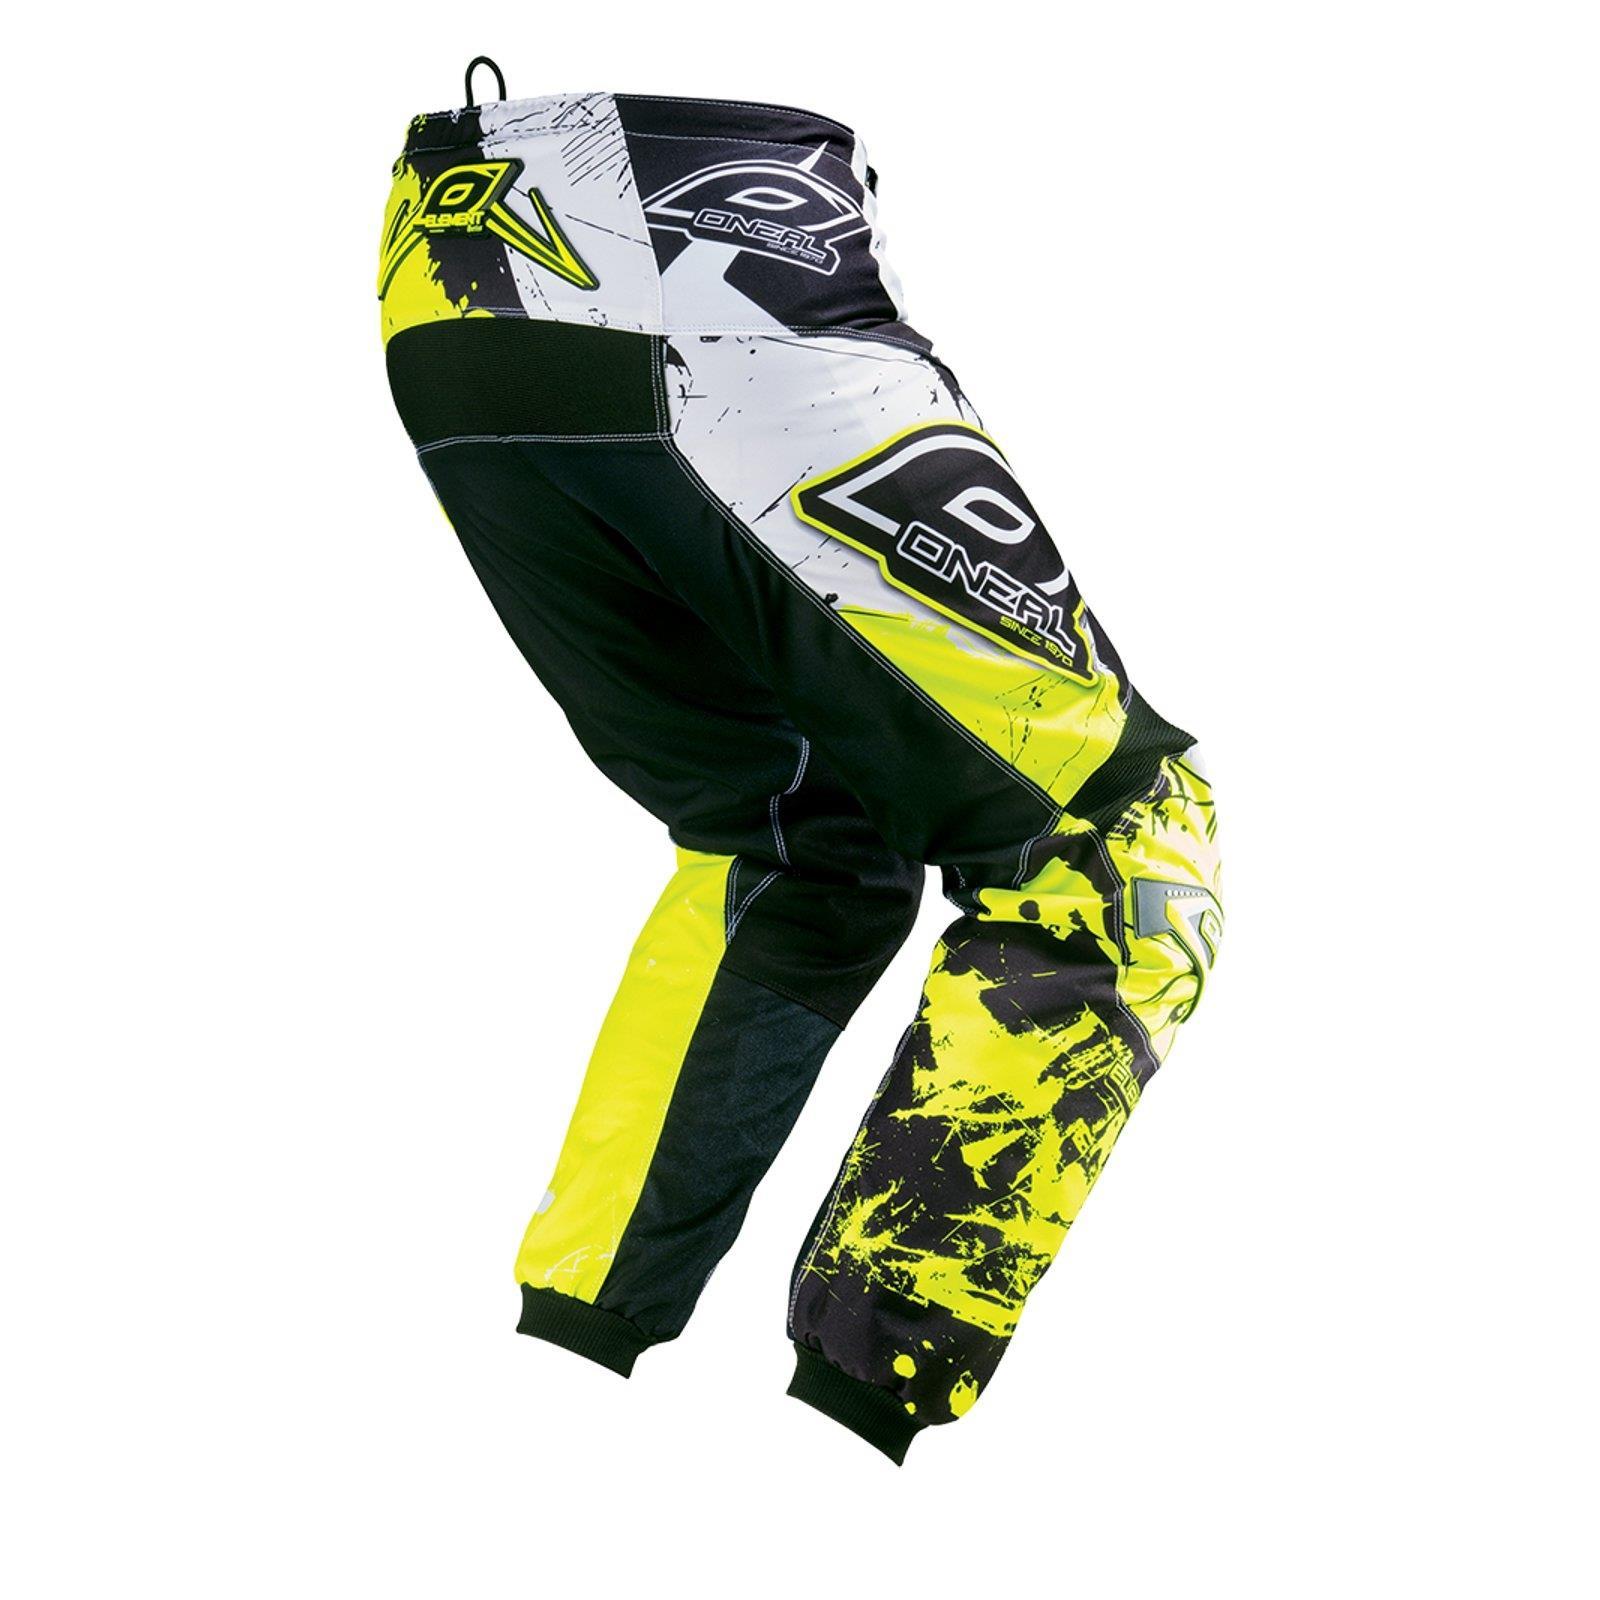 O-039-Neal-elemento-Mayhem-Hardwear-Pants-Pantaloni-MX-MOTO-CROSS-ENDURO-OFFROAD-Pelle miniatura 60